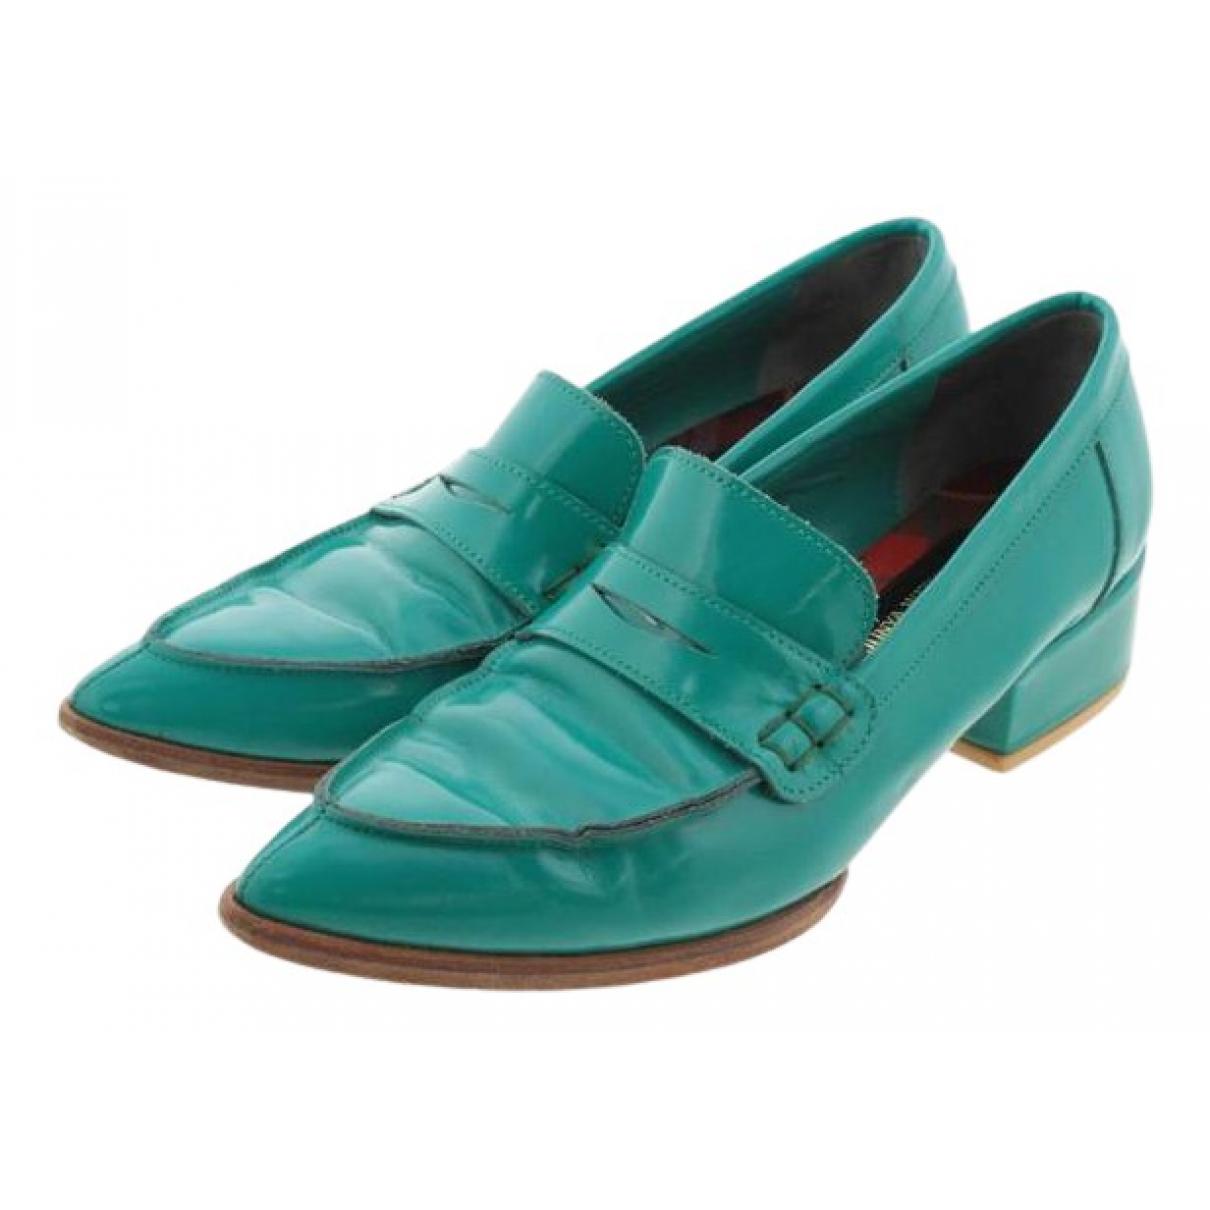 Comme Des Garcons N Green Patent leather Ballet flats for Women 40 EU